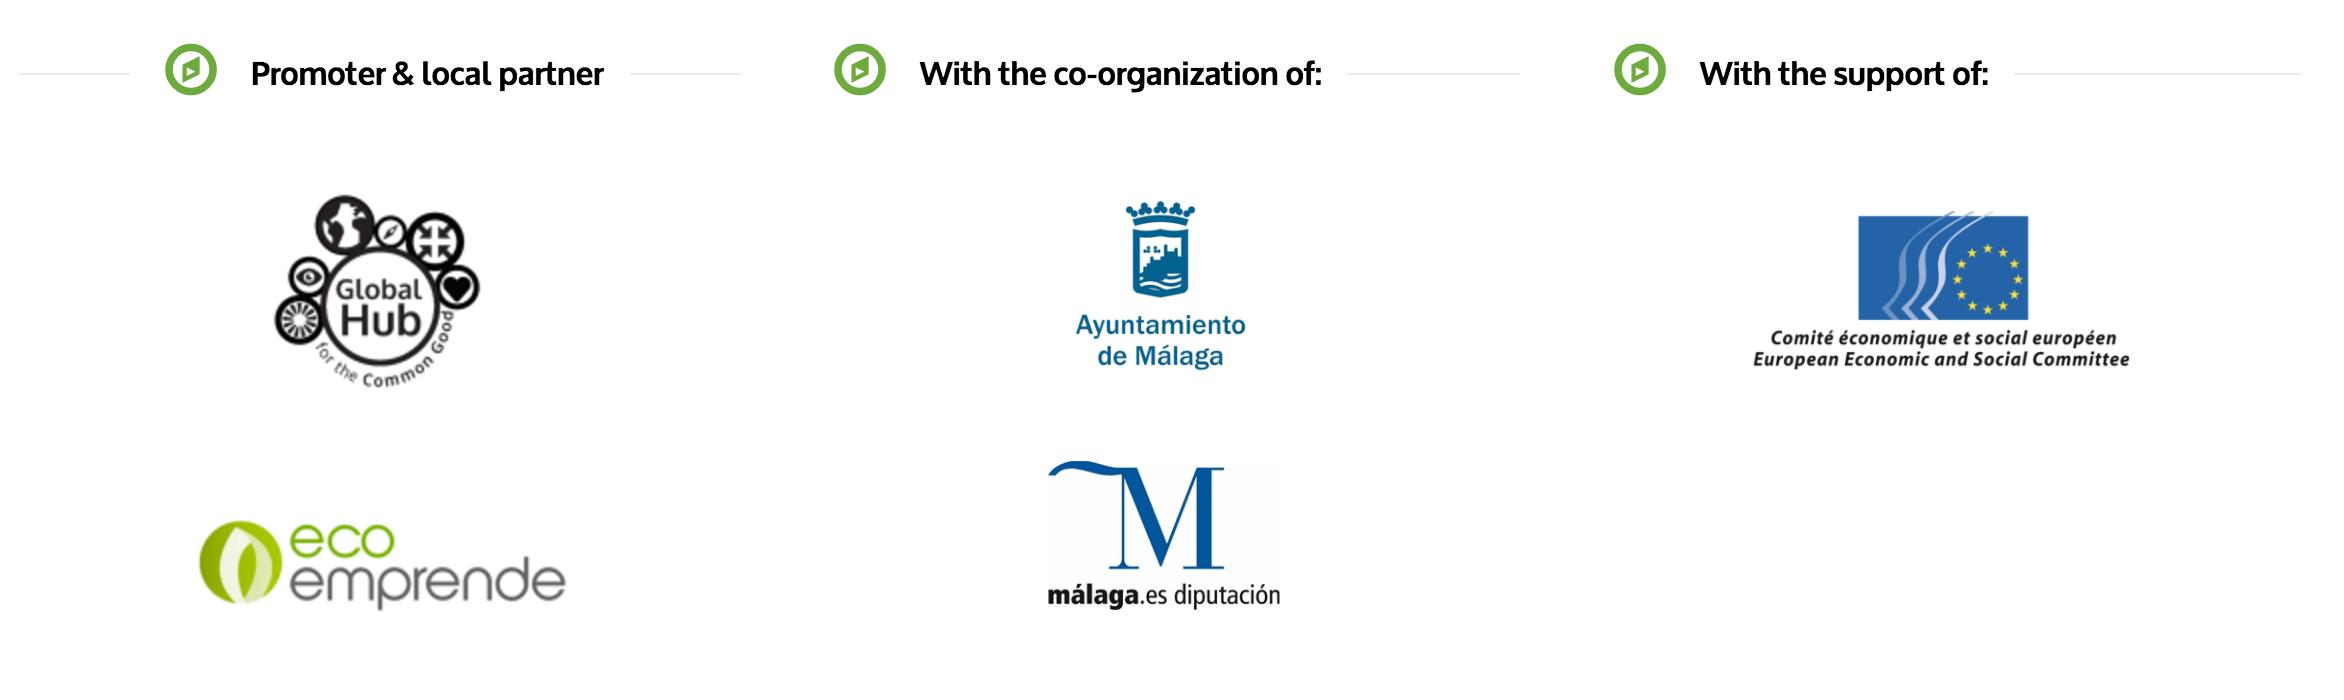 Logos coorganizers